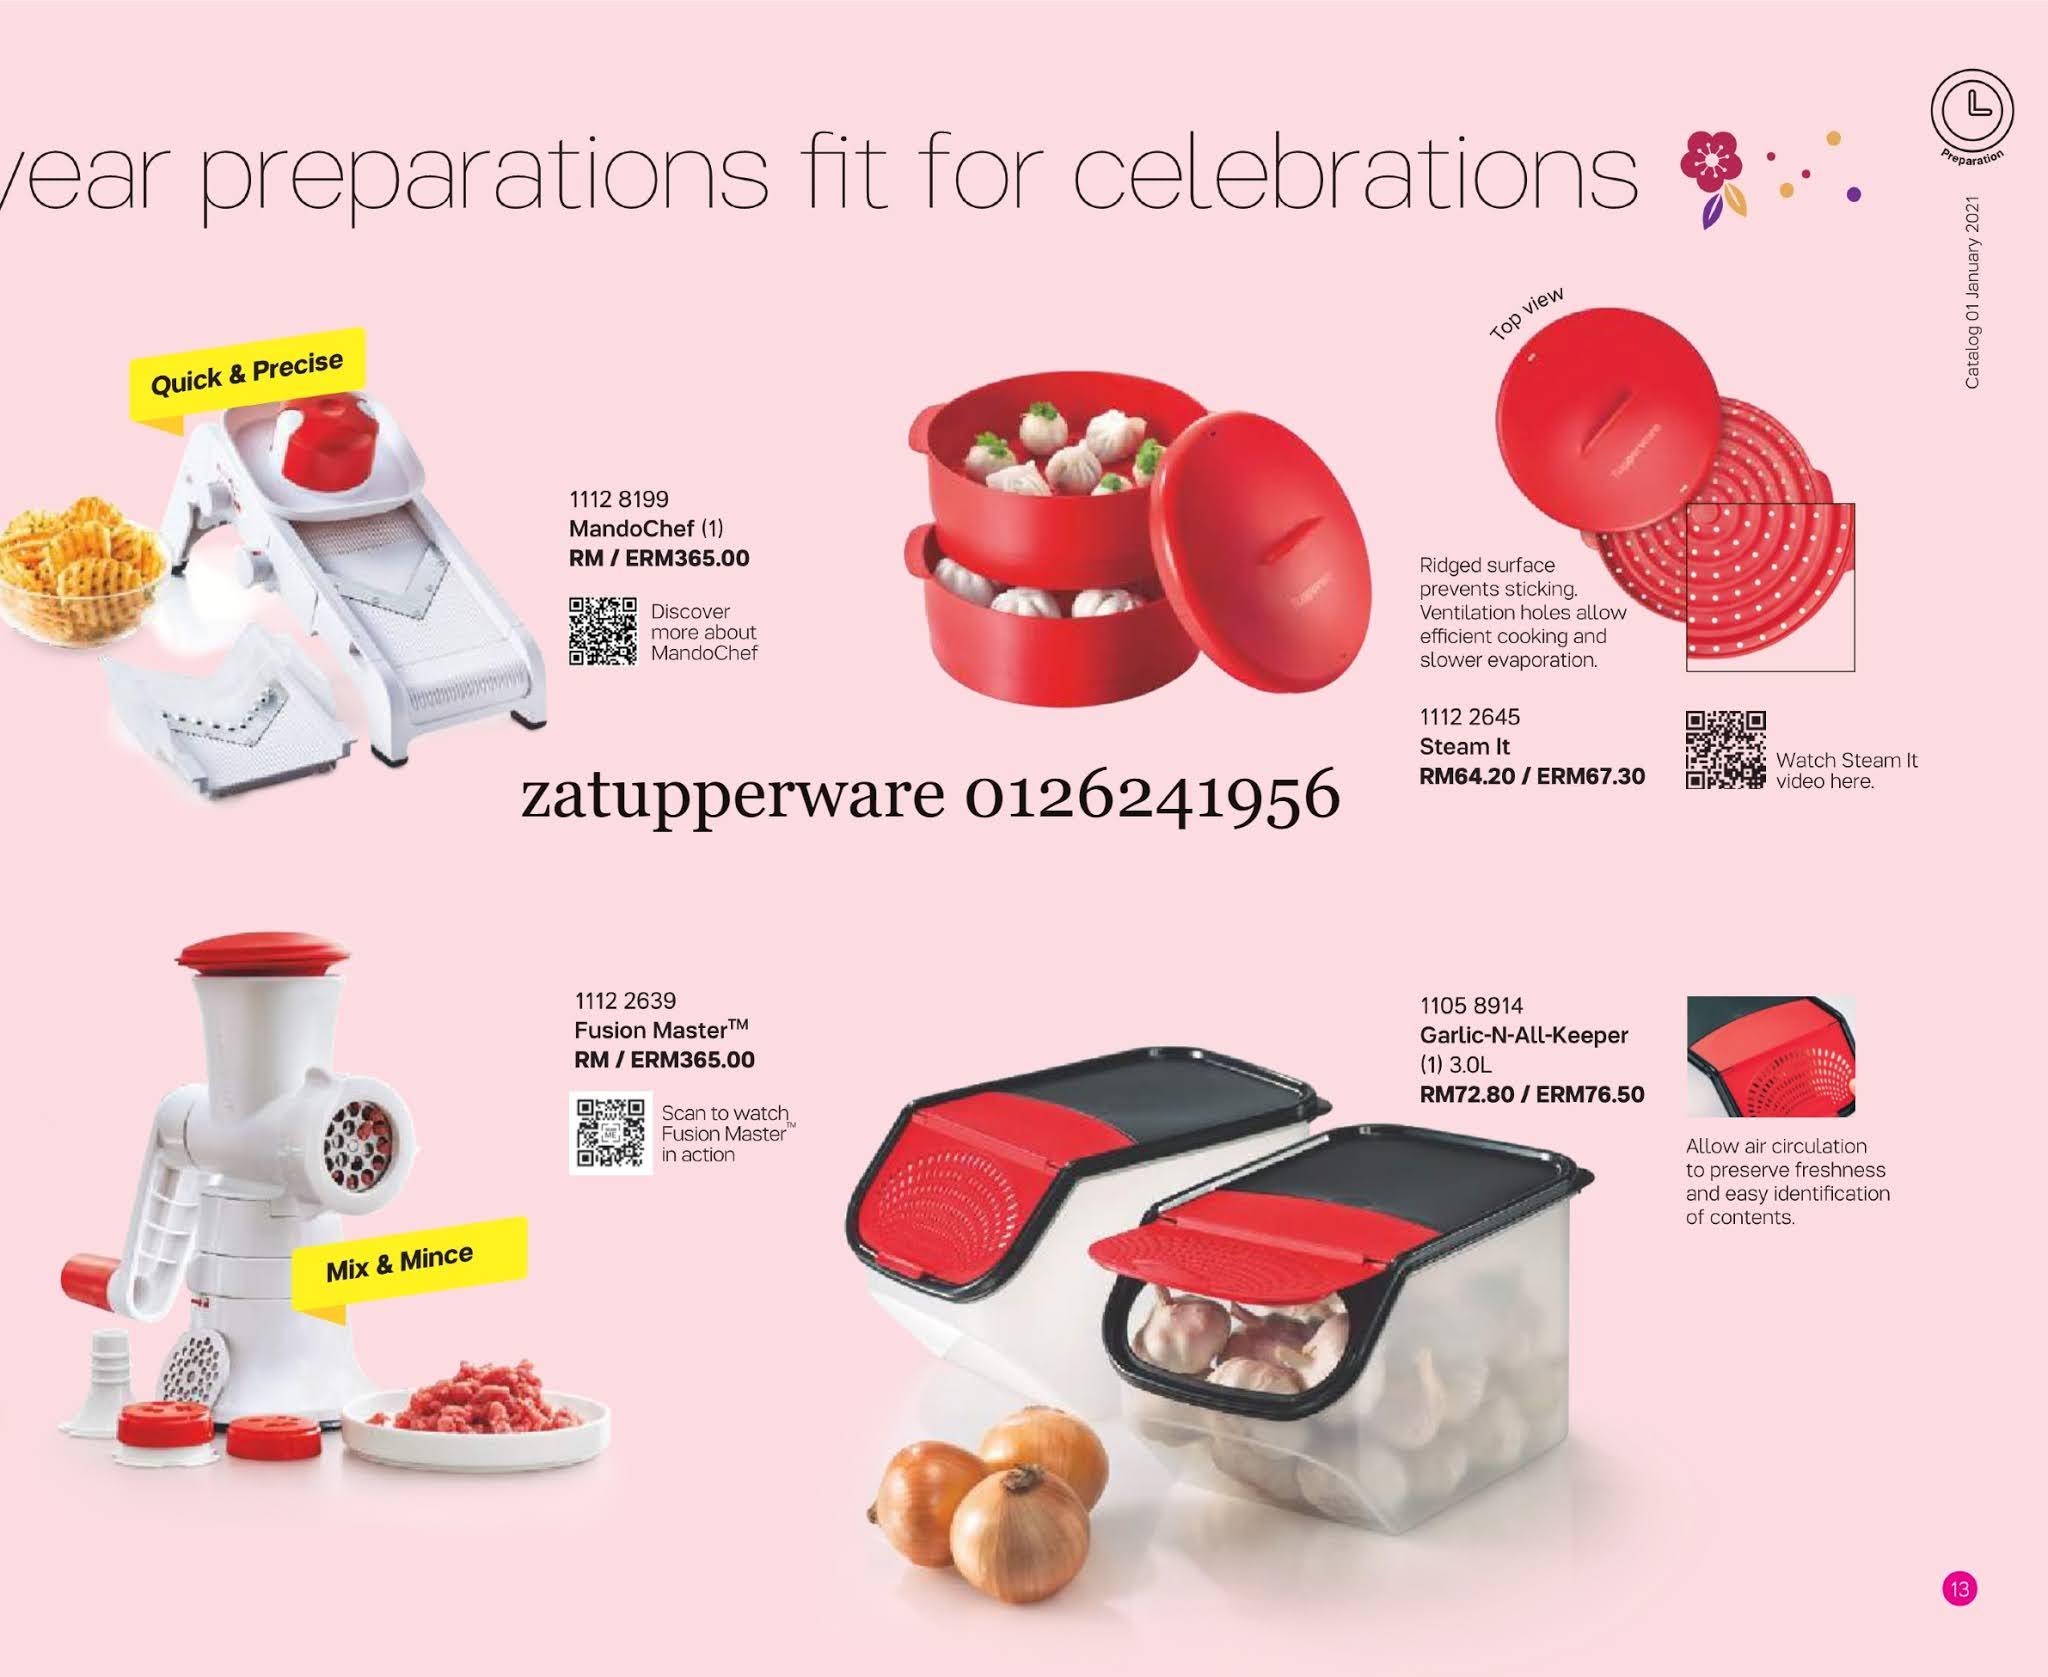 Za Tupperware Malaysia : Latest Catalogue 2021